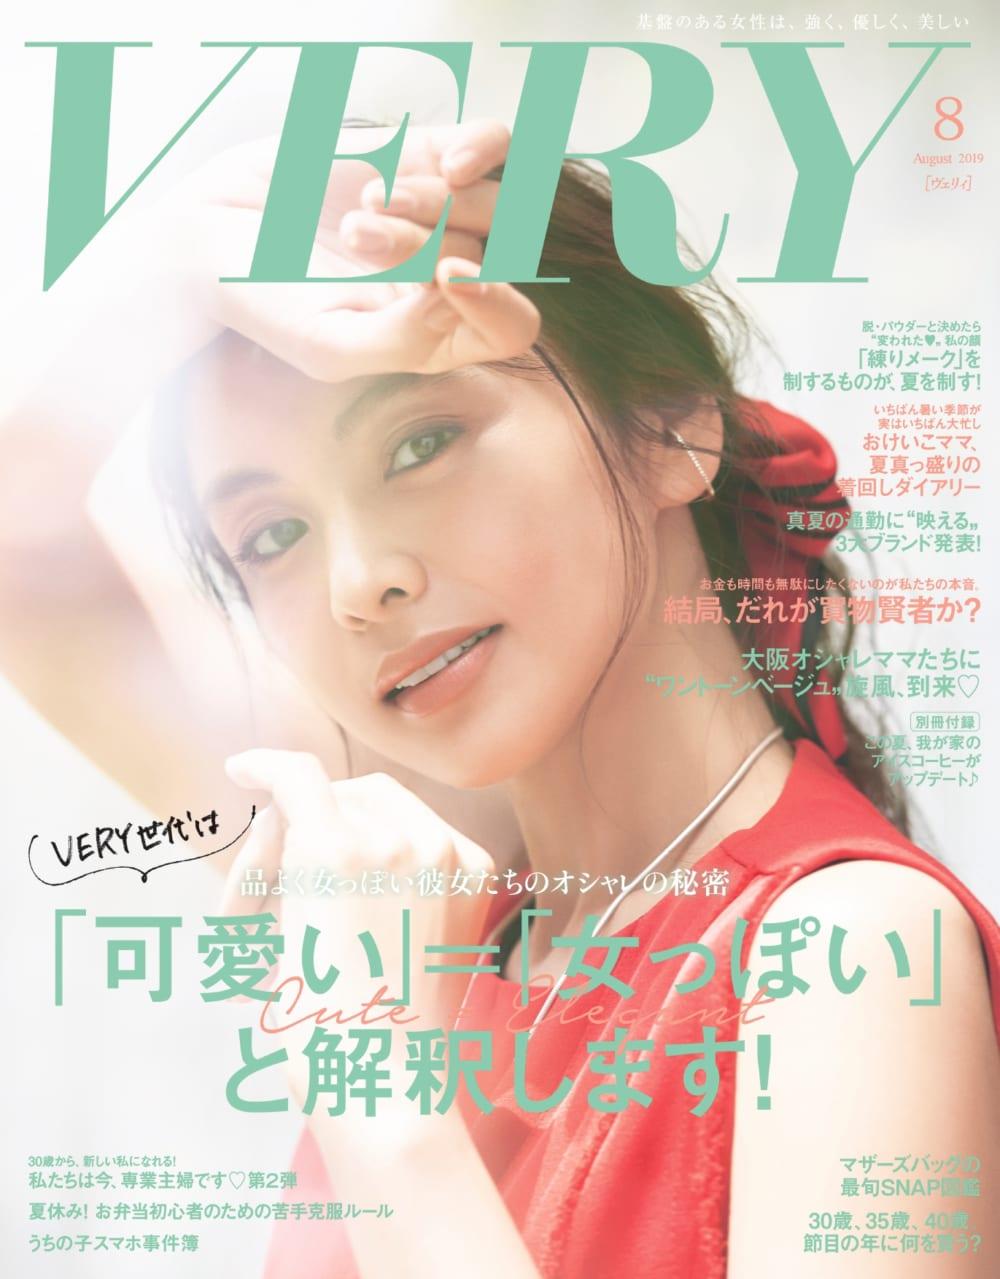 2019/07/VERY_1908_001_page-0001.jpg